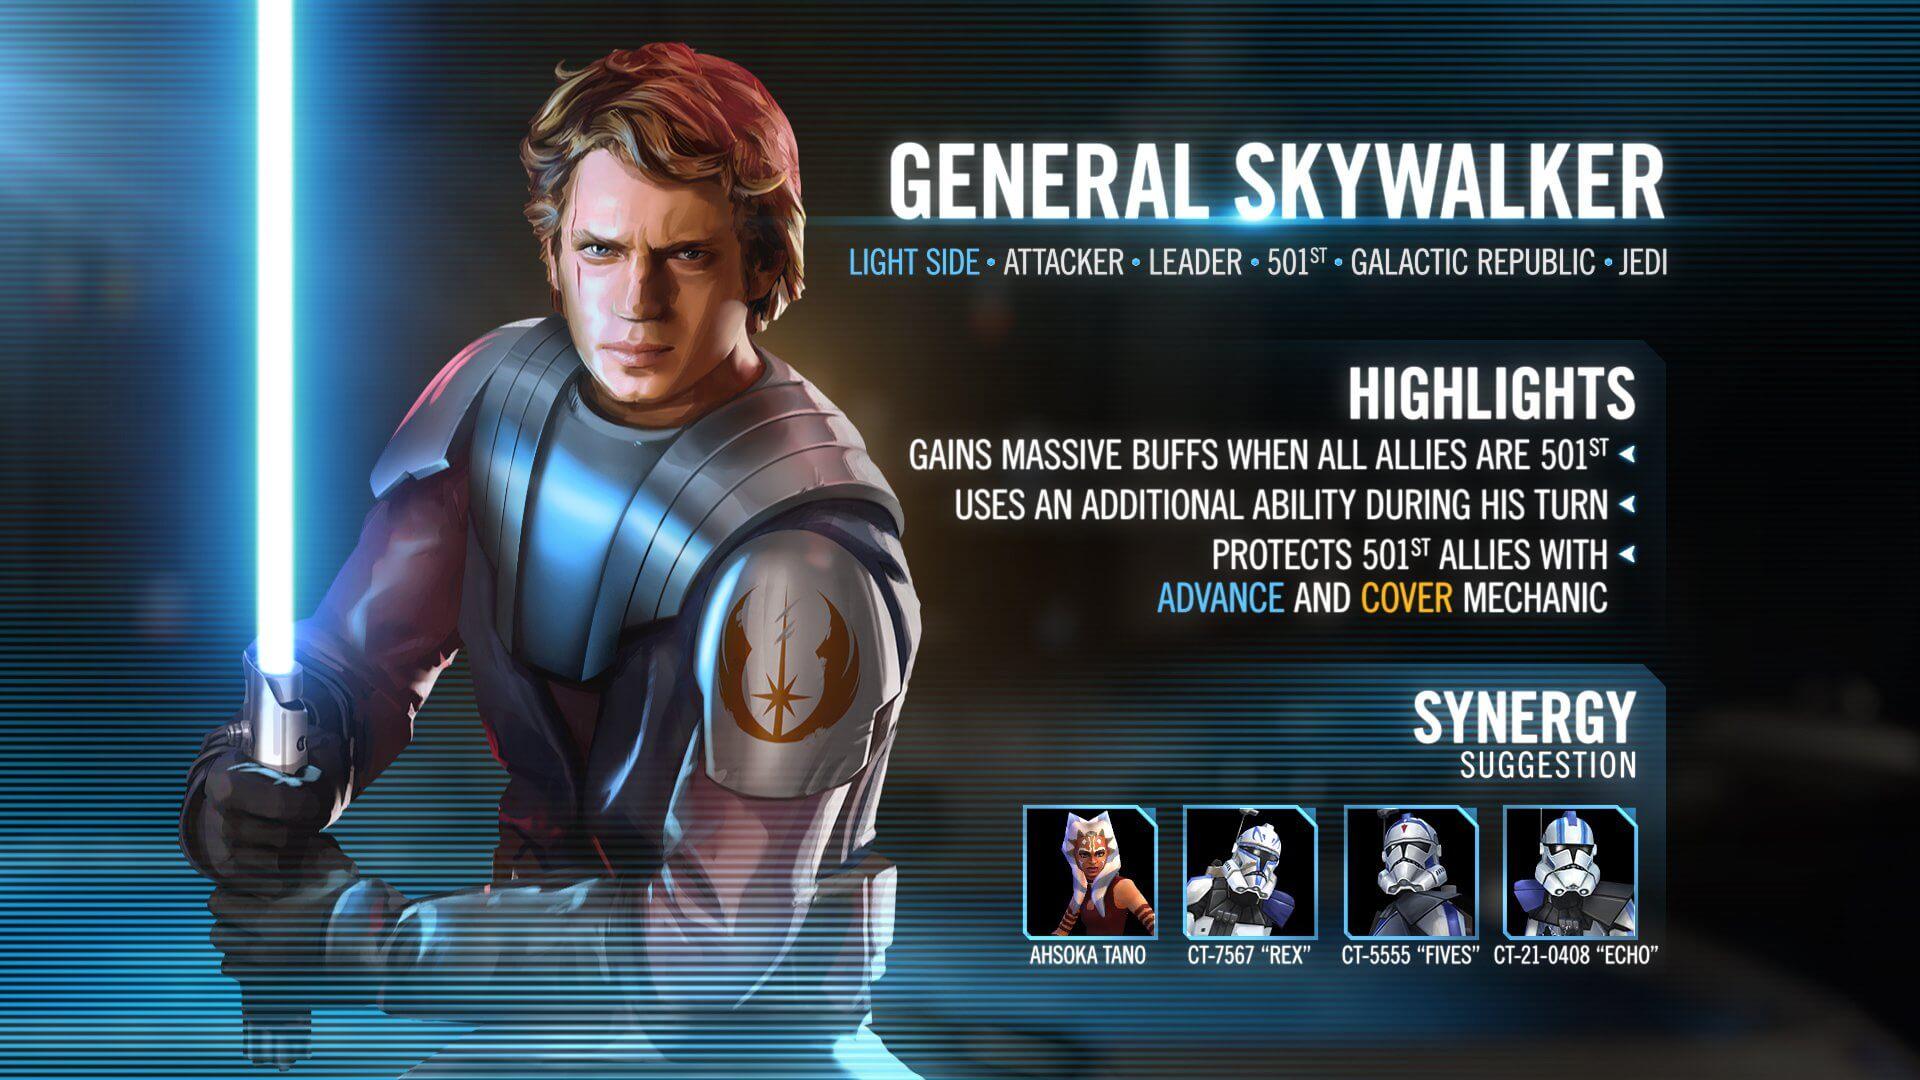 The November 2019 General Skywalker Soft Counter Guide Star